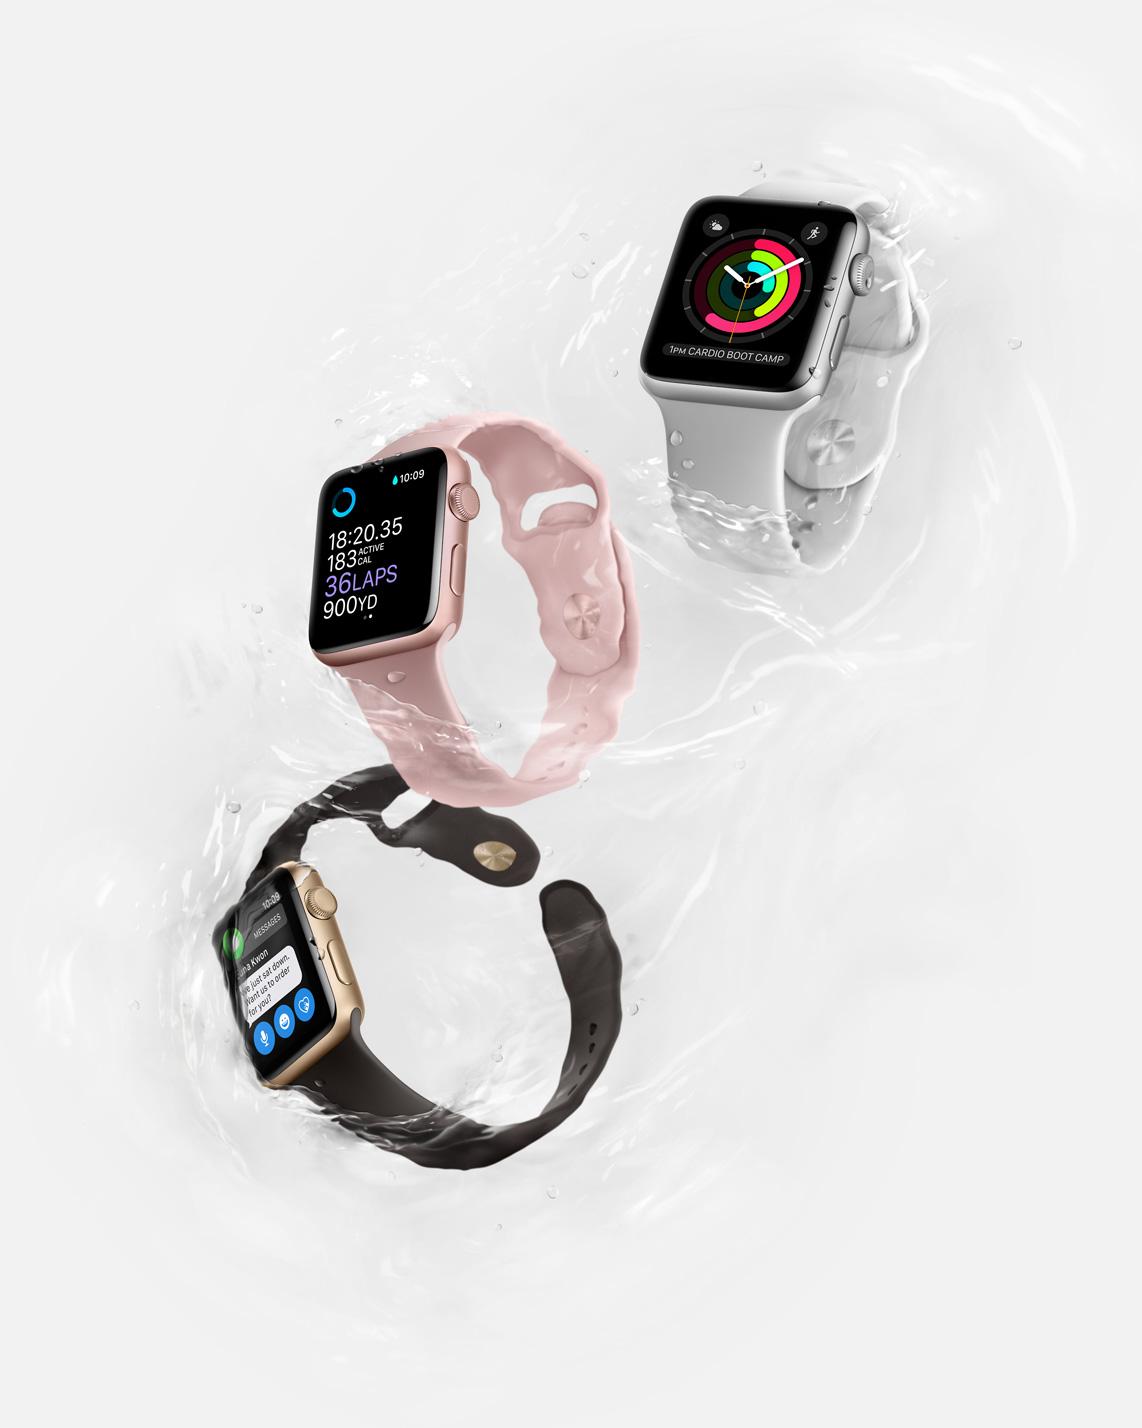 apple-watch2-3up-water.jpg